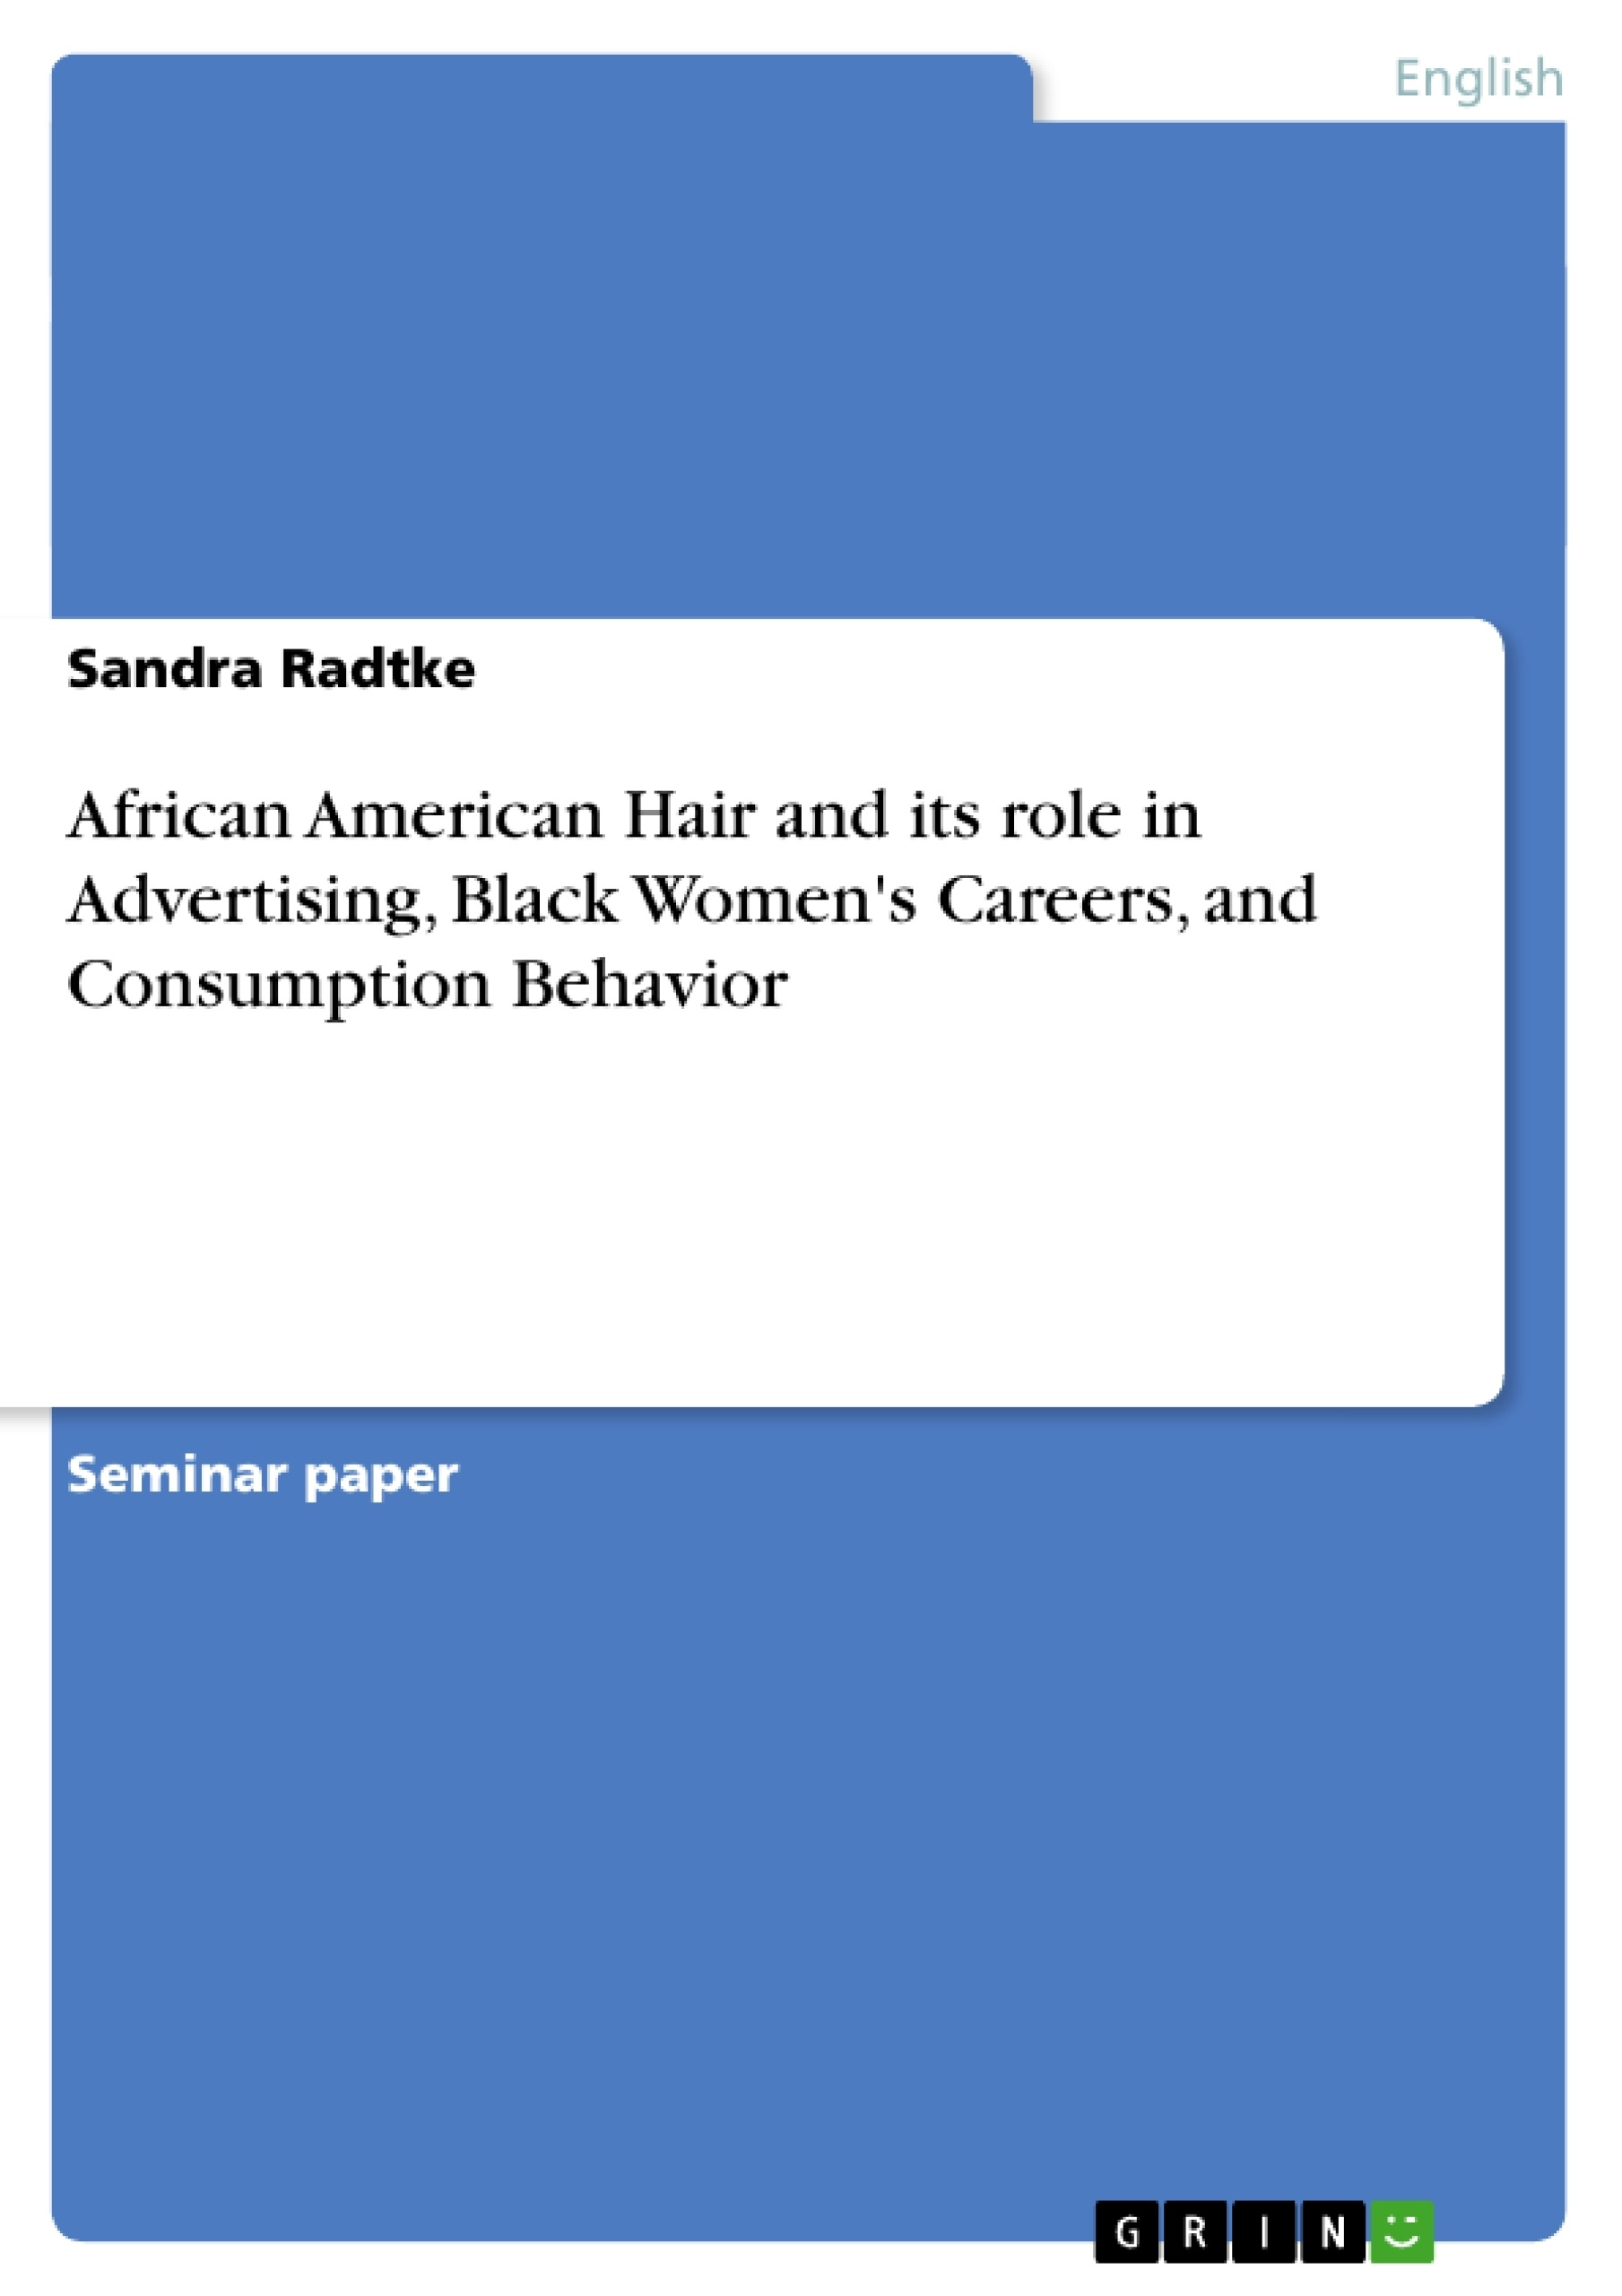 essay on women in advertising